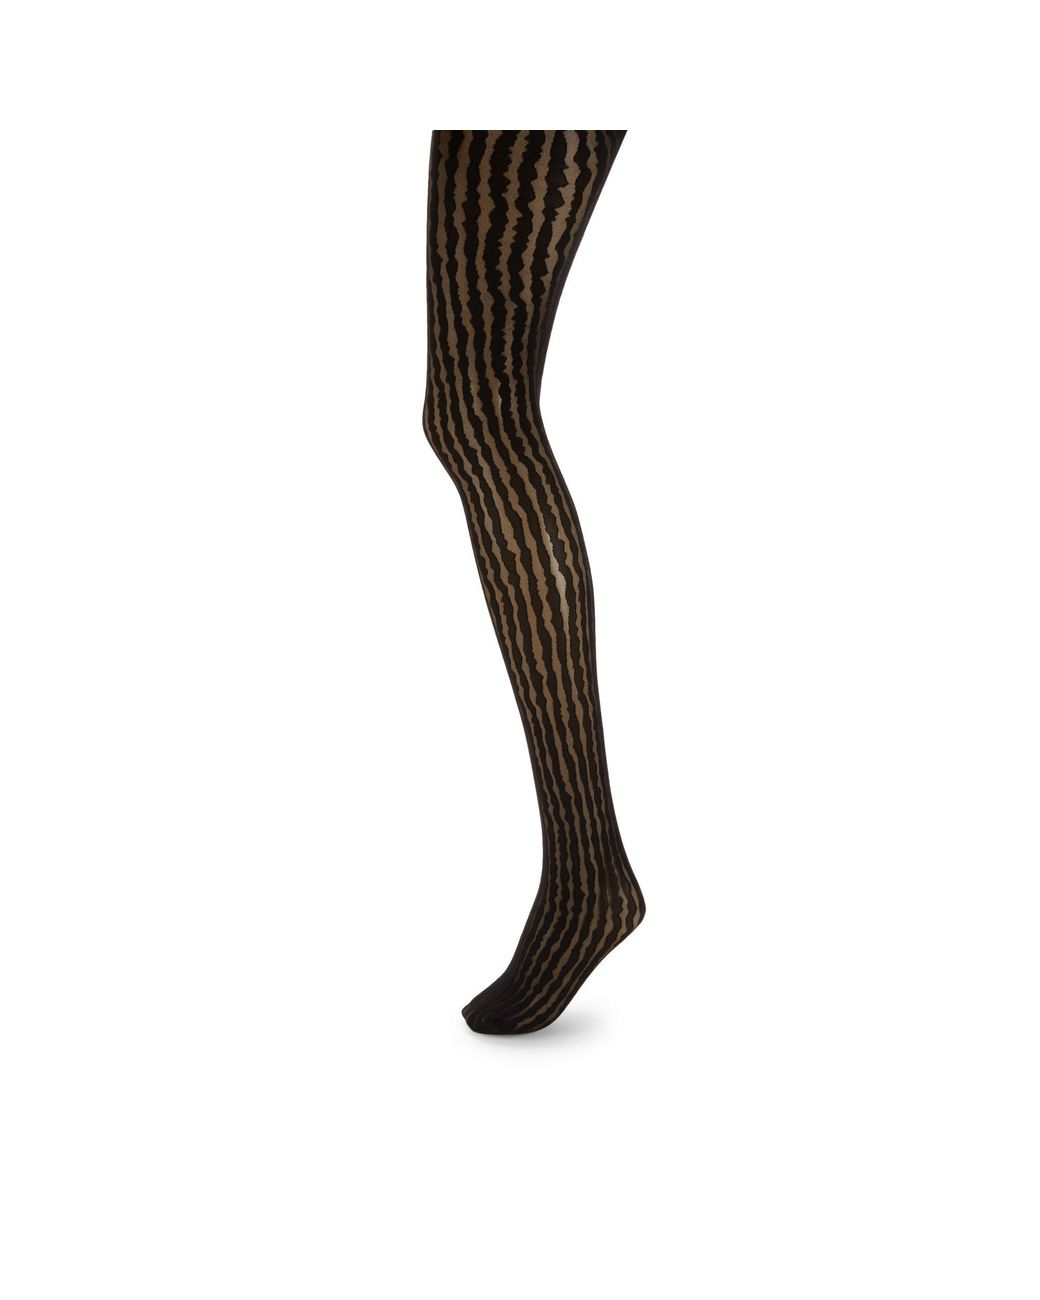 Black Pantyhose Stockings Women Geometric Print Block Stripe Sheer Hosiery Nylon